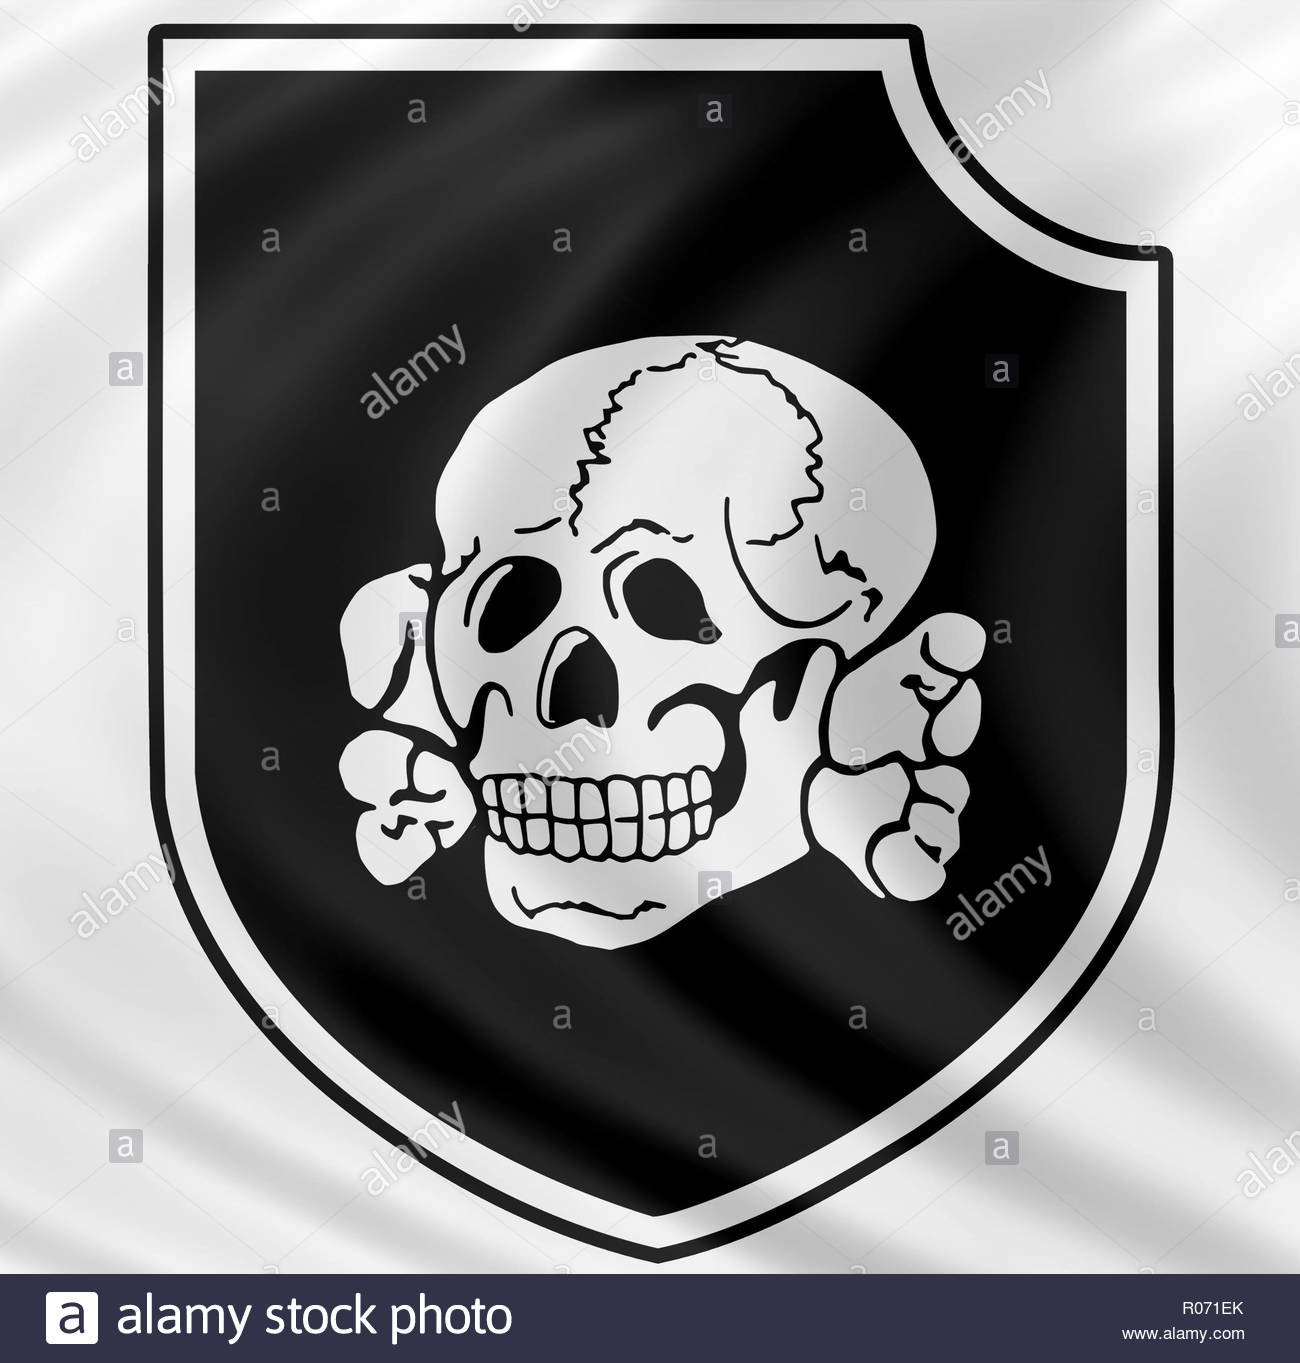 3rd SS Panzer Division Totenkopf logo - Stock Image